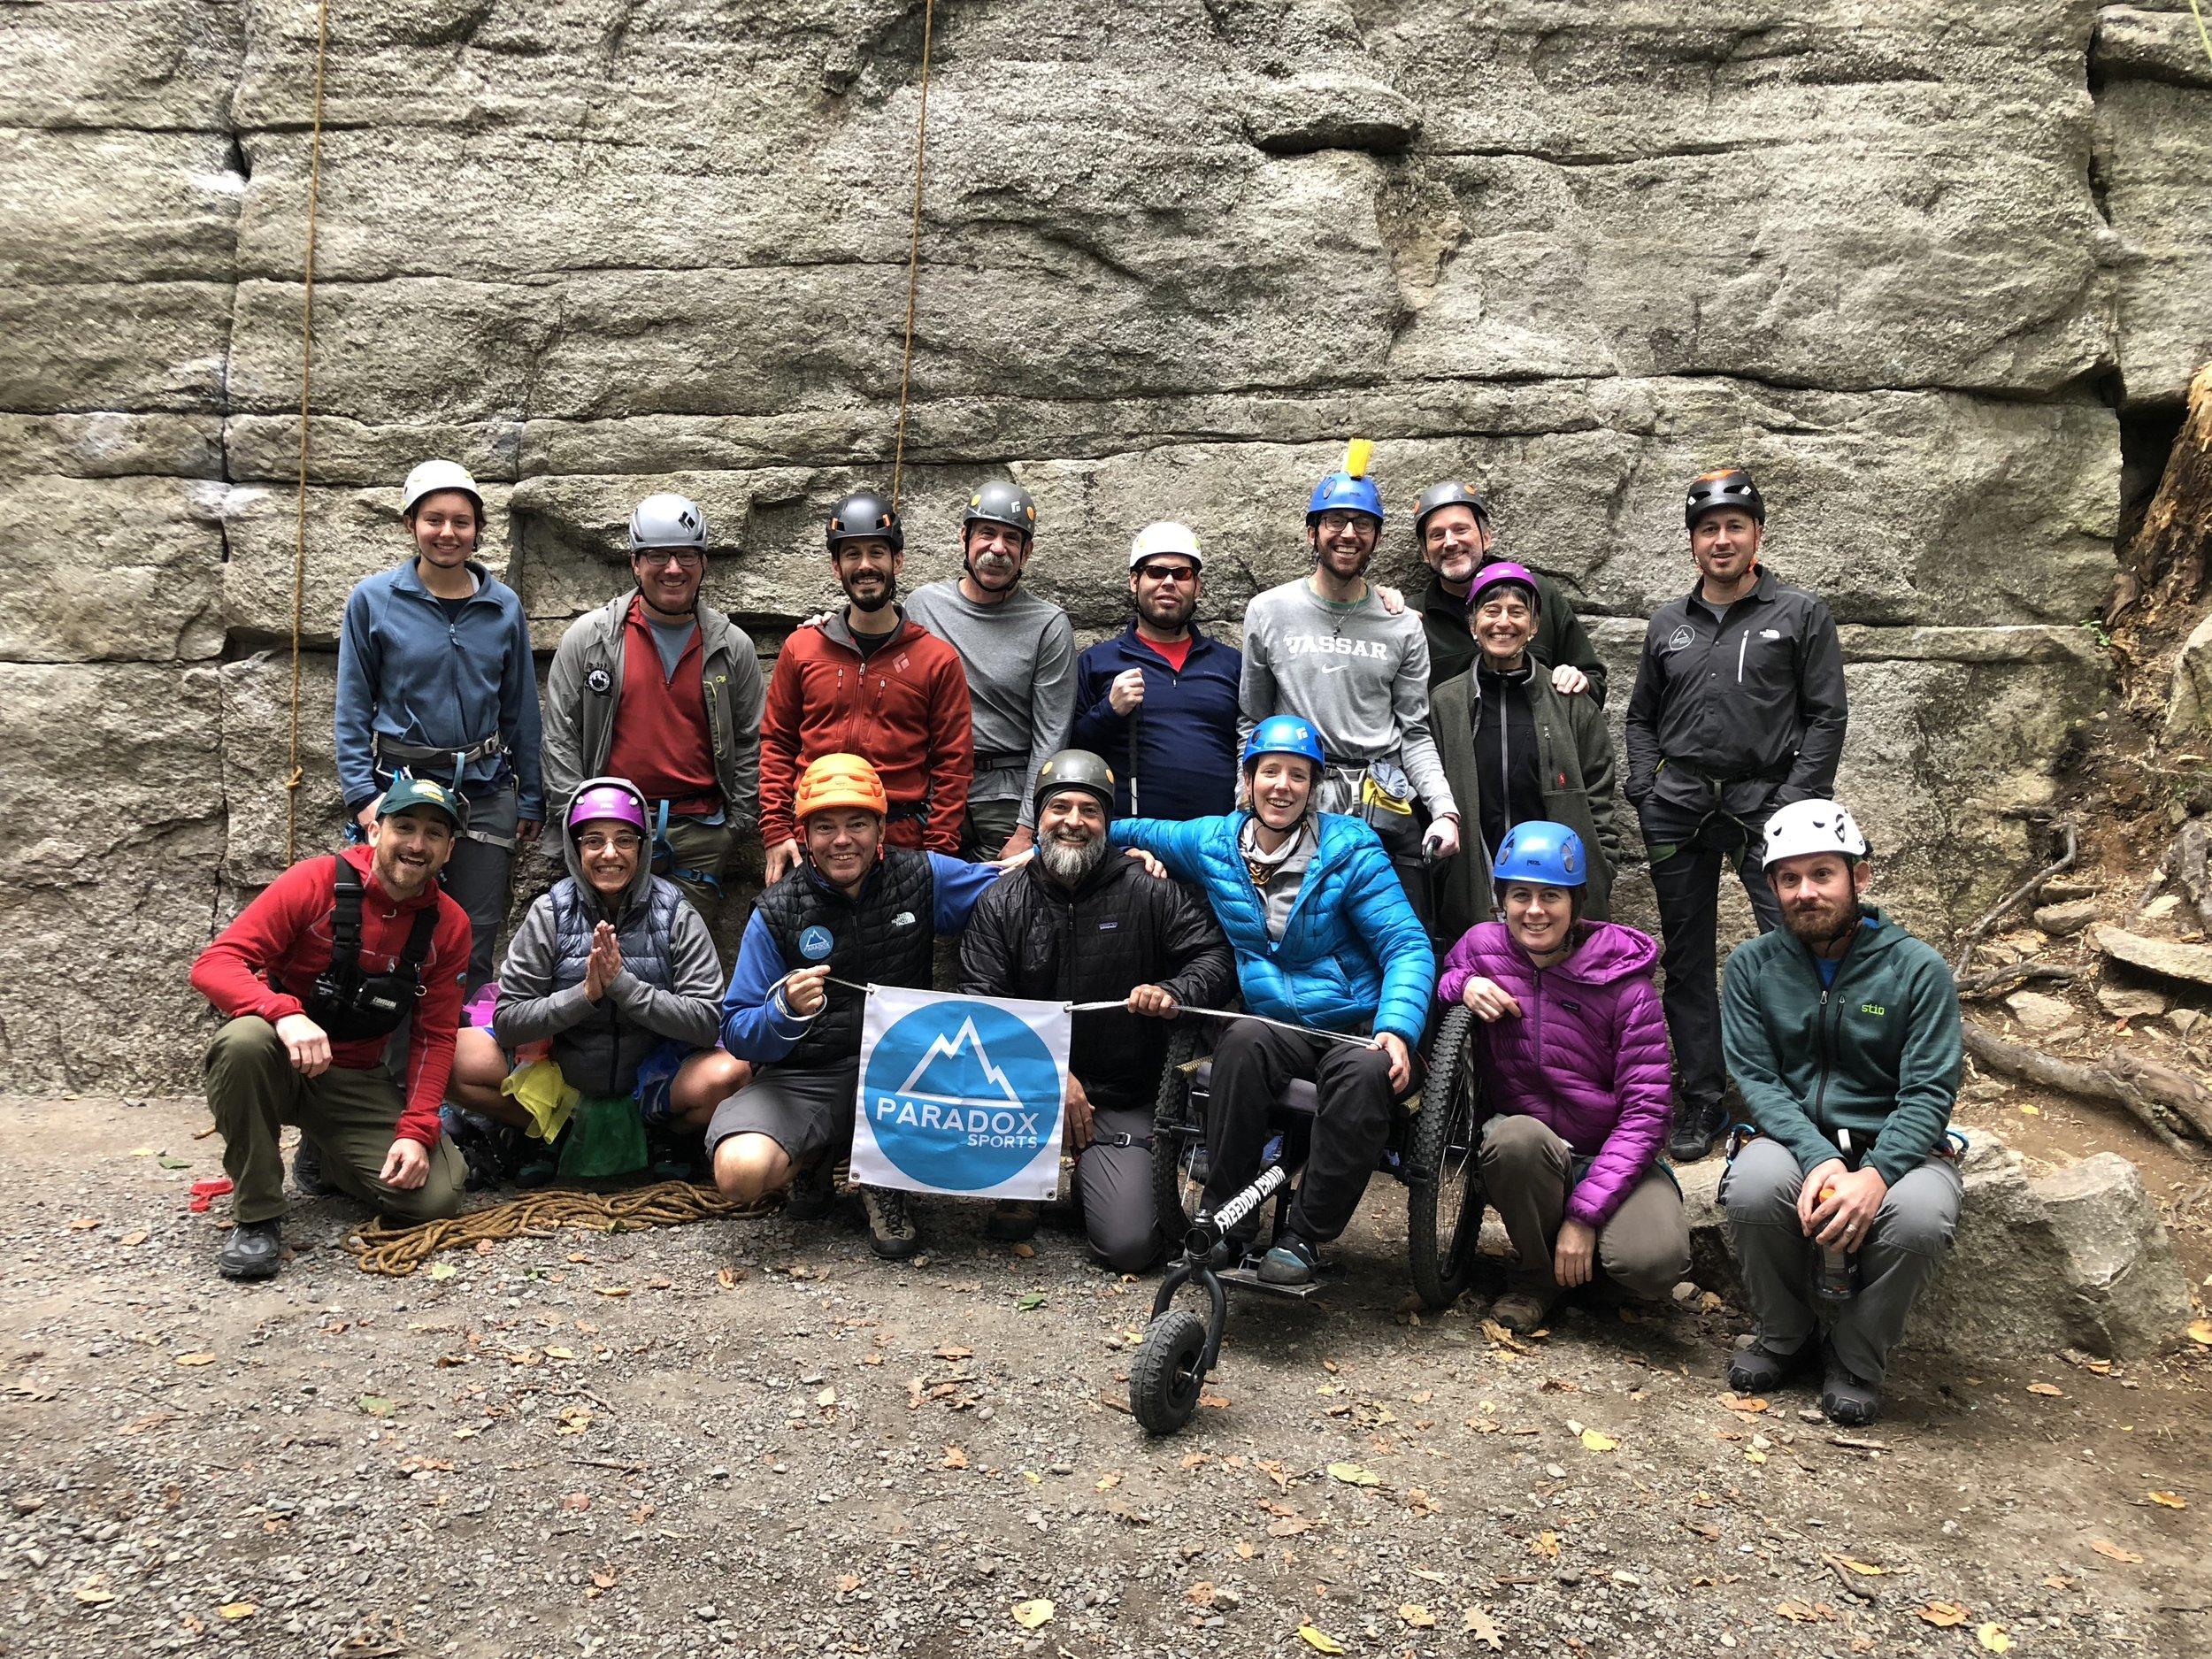 The Paradox Sports climbing team for the 2018 Gunks trip!